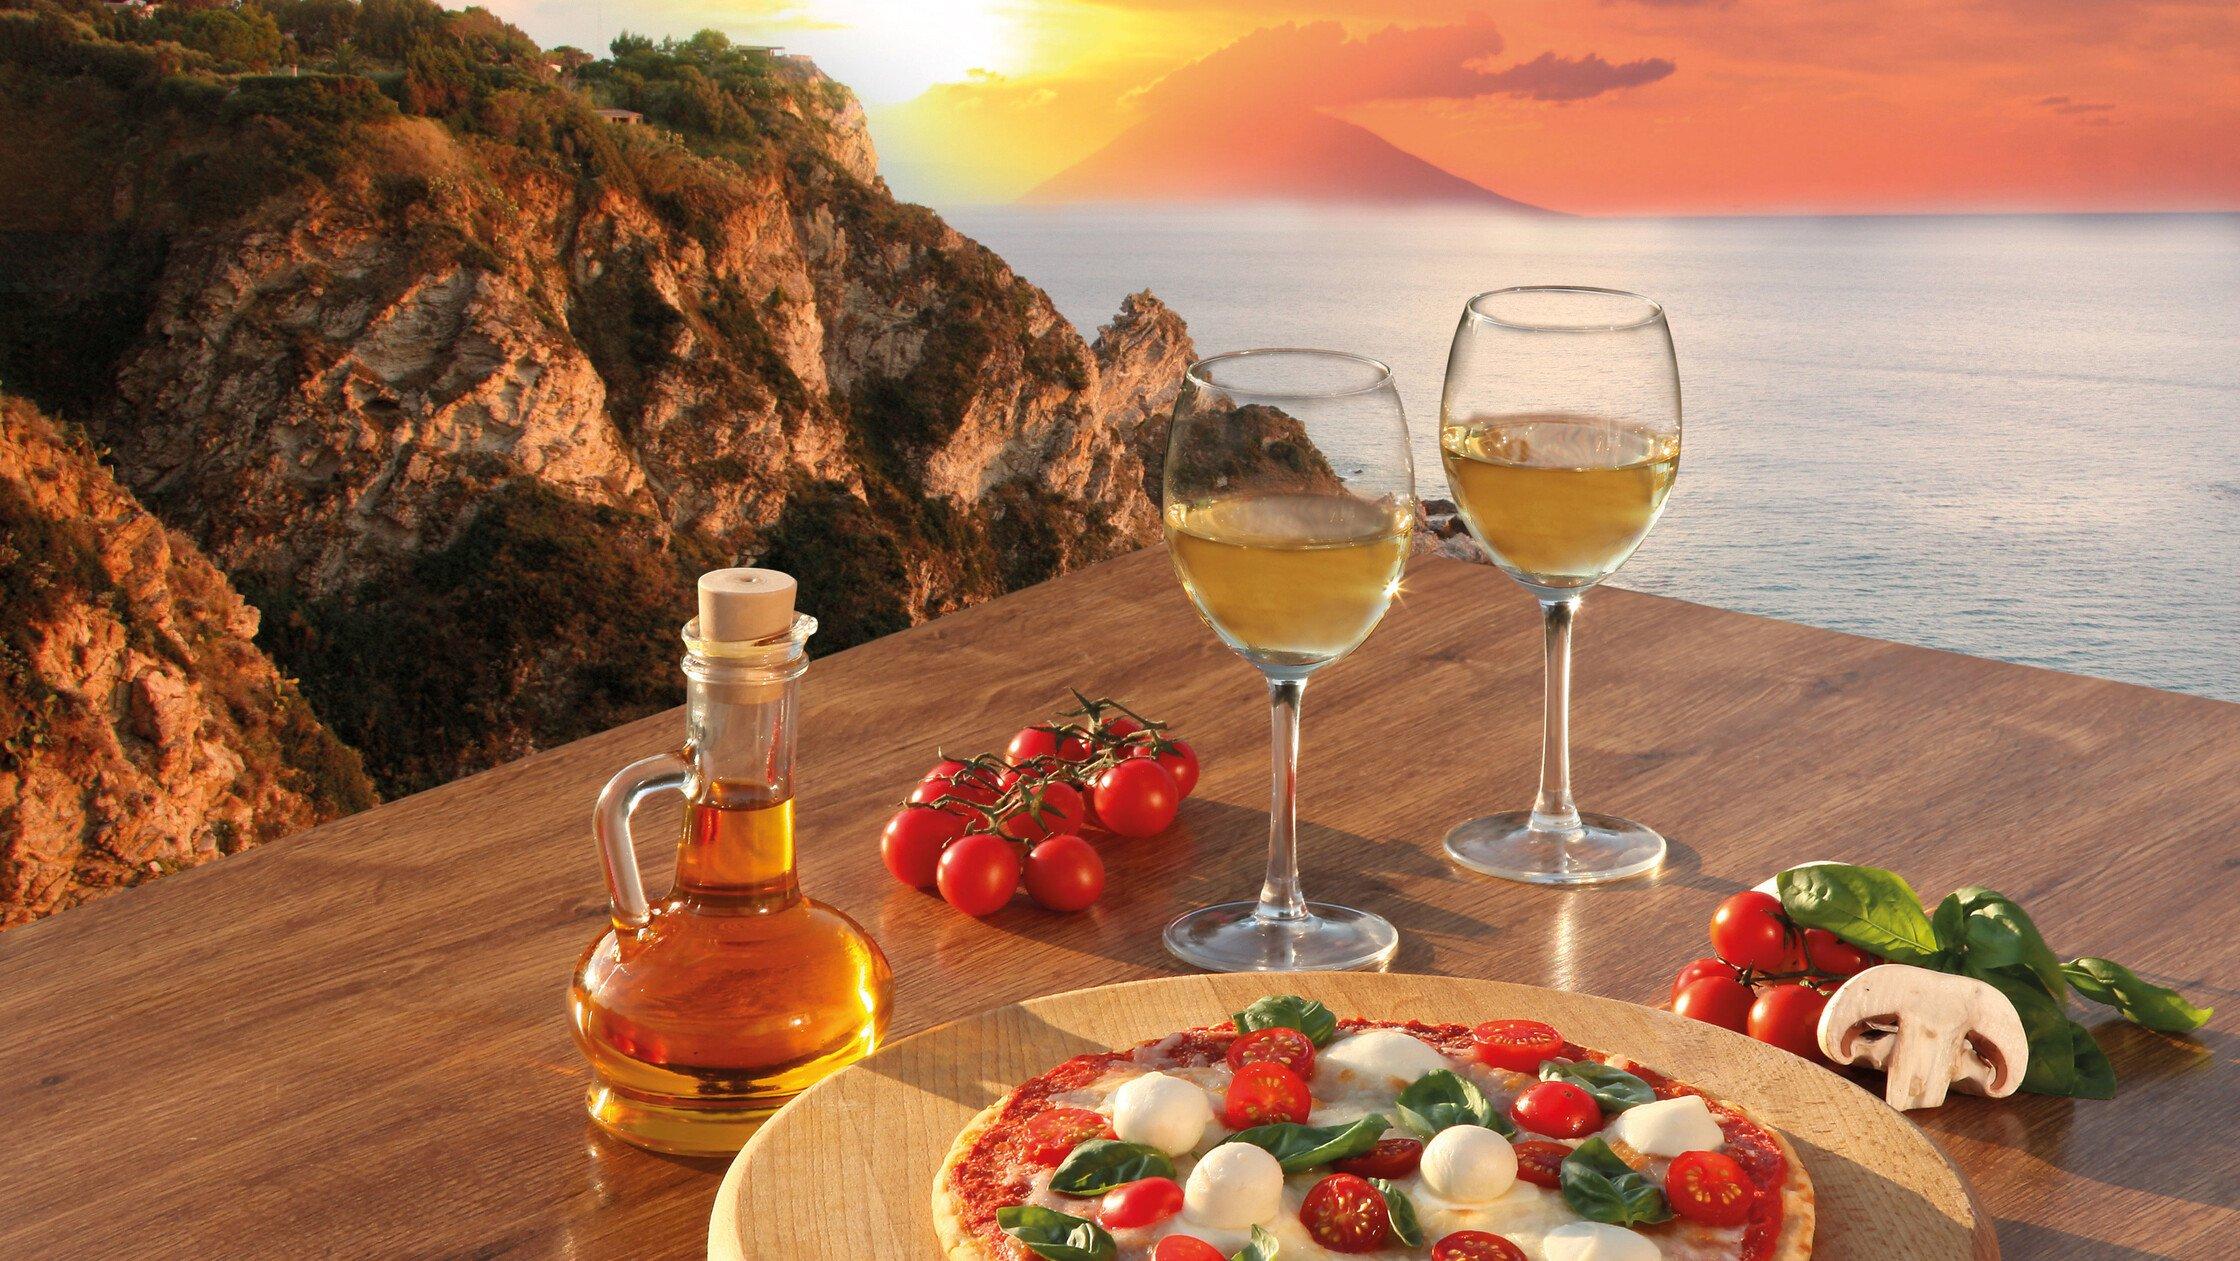 Italienische Pizza bei Sonnenuntergang